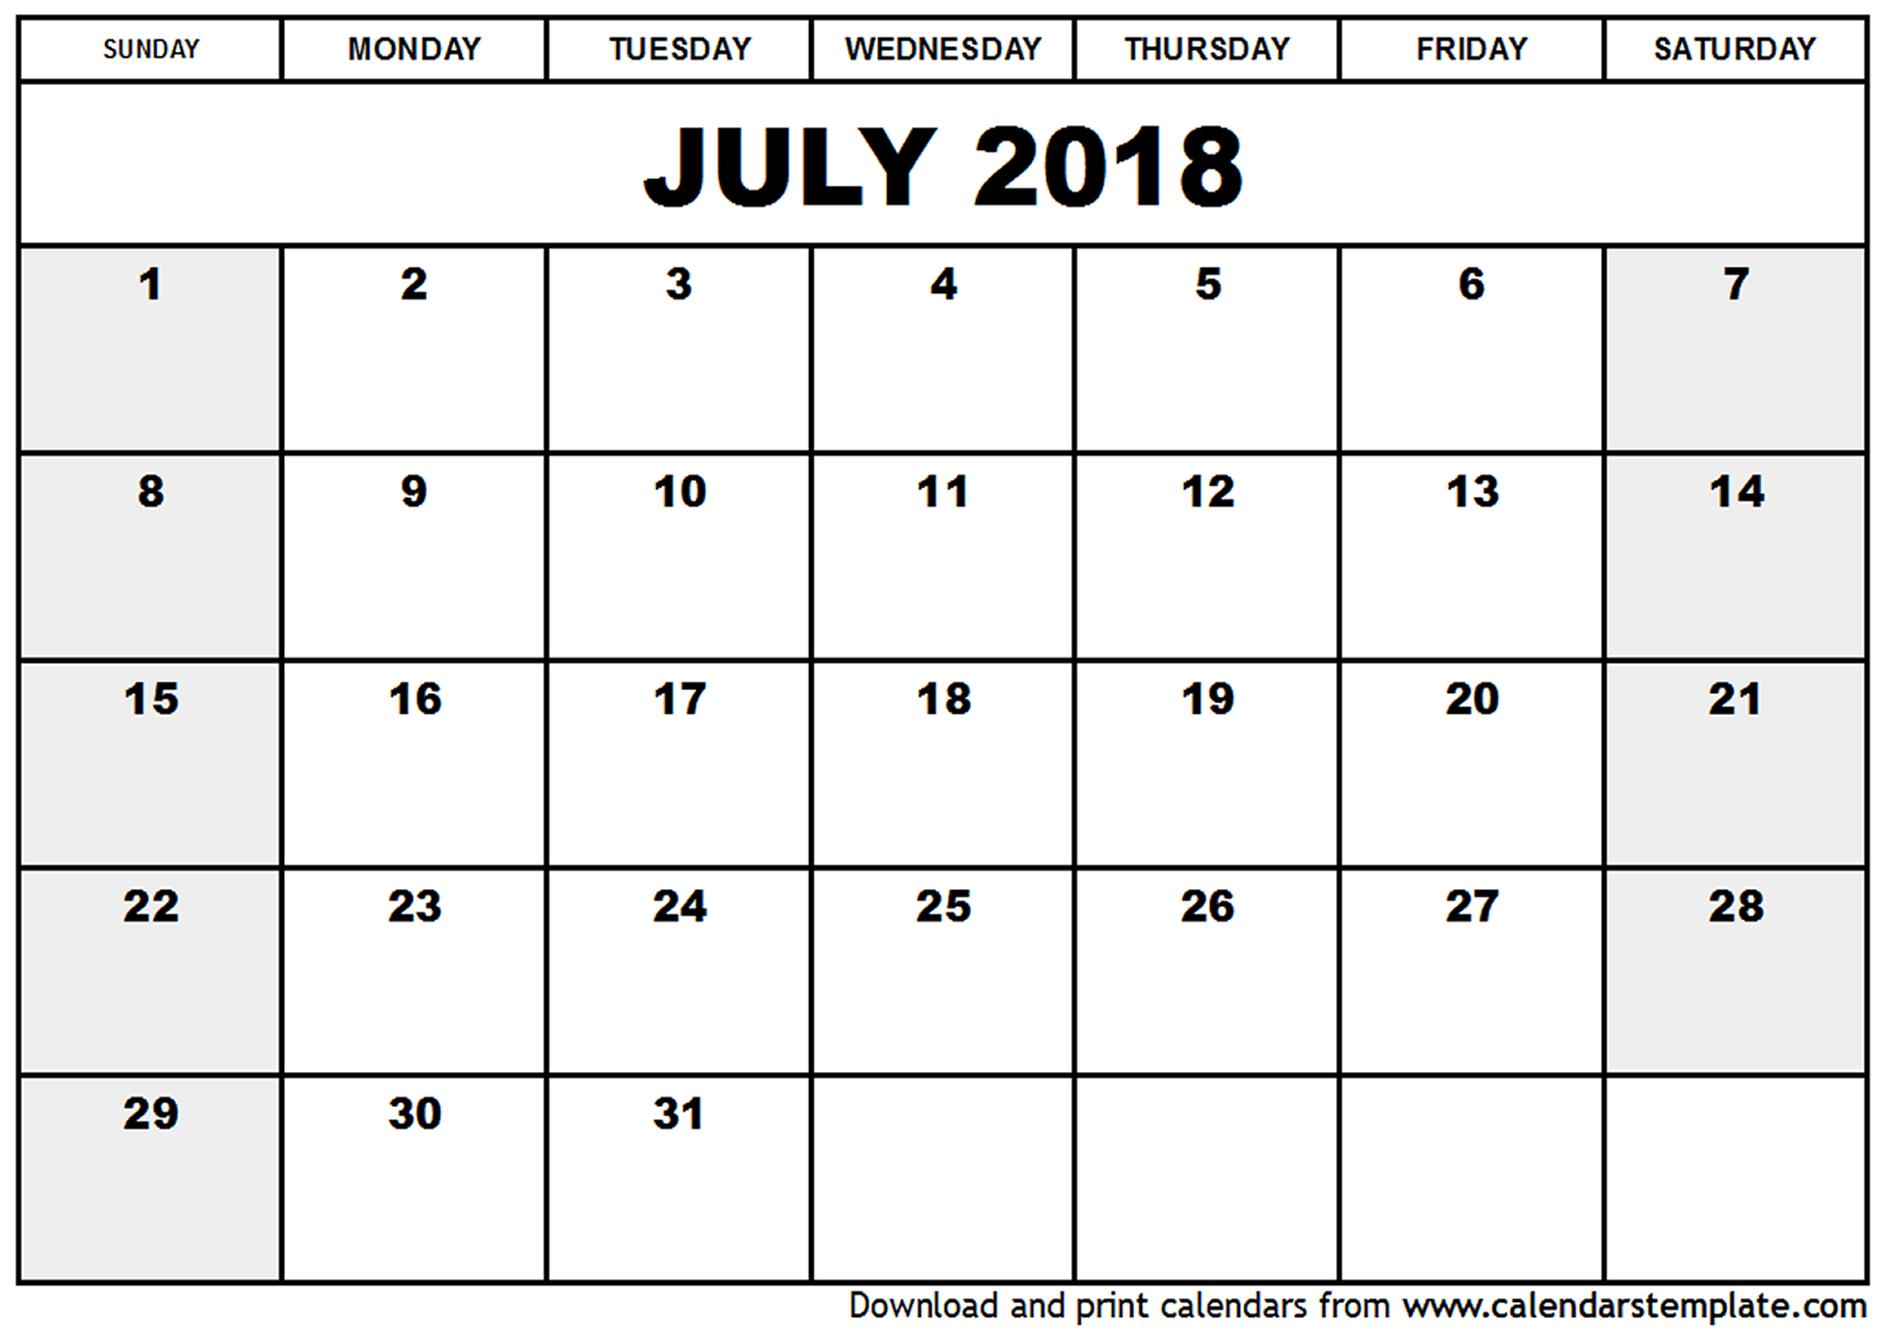 Blank July 2018 Calendar intended for Blank July Calendar Printable